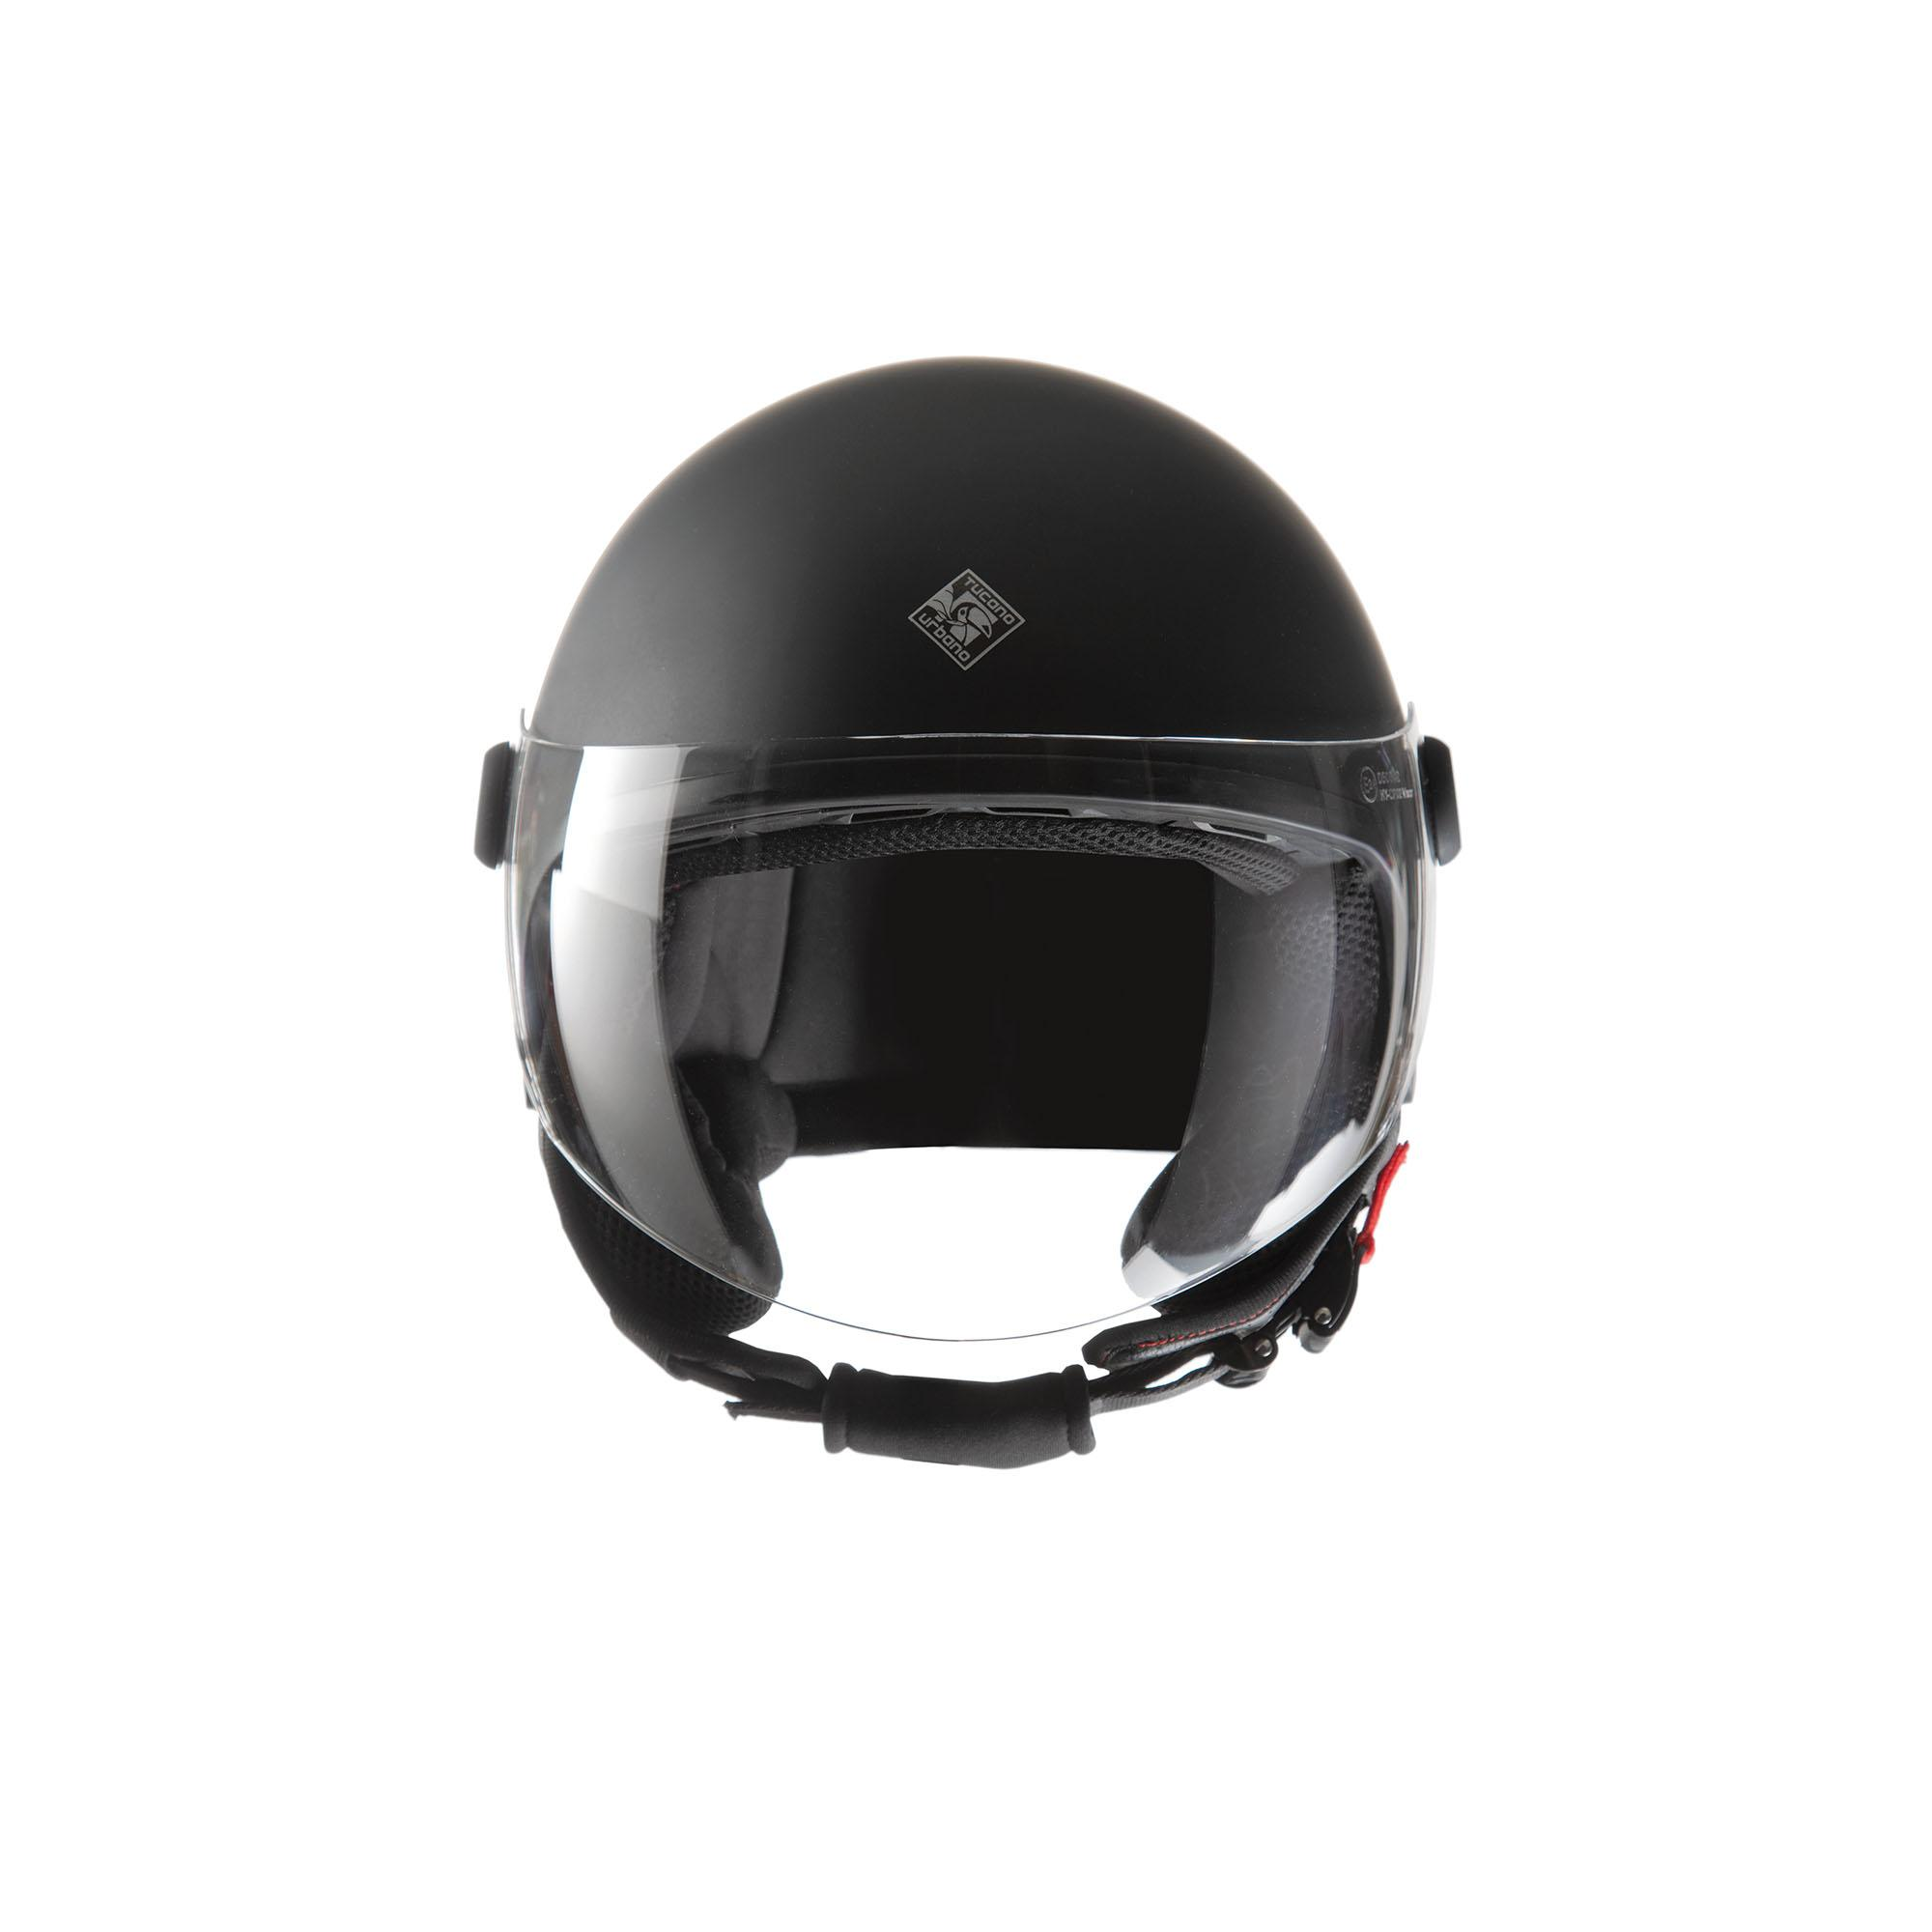 Demi–jet Helmet El'jettin 100% Polycarbonate – Inner: 100% Polystyrene – Lining: 100% Polyester